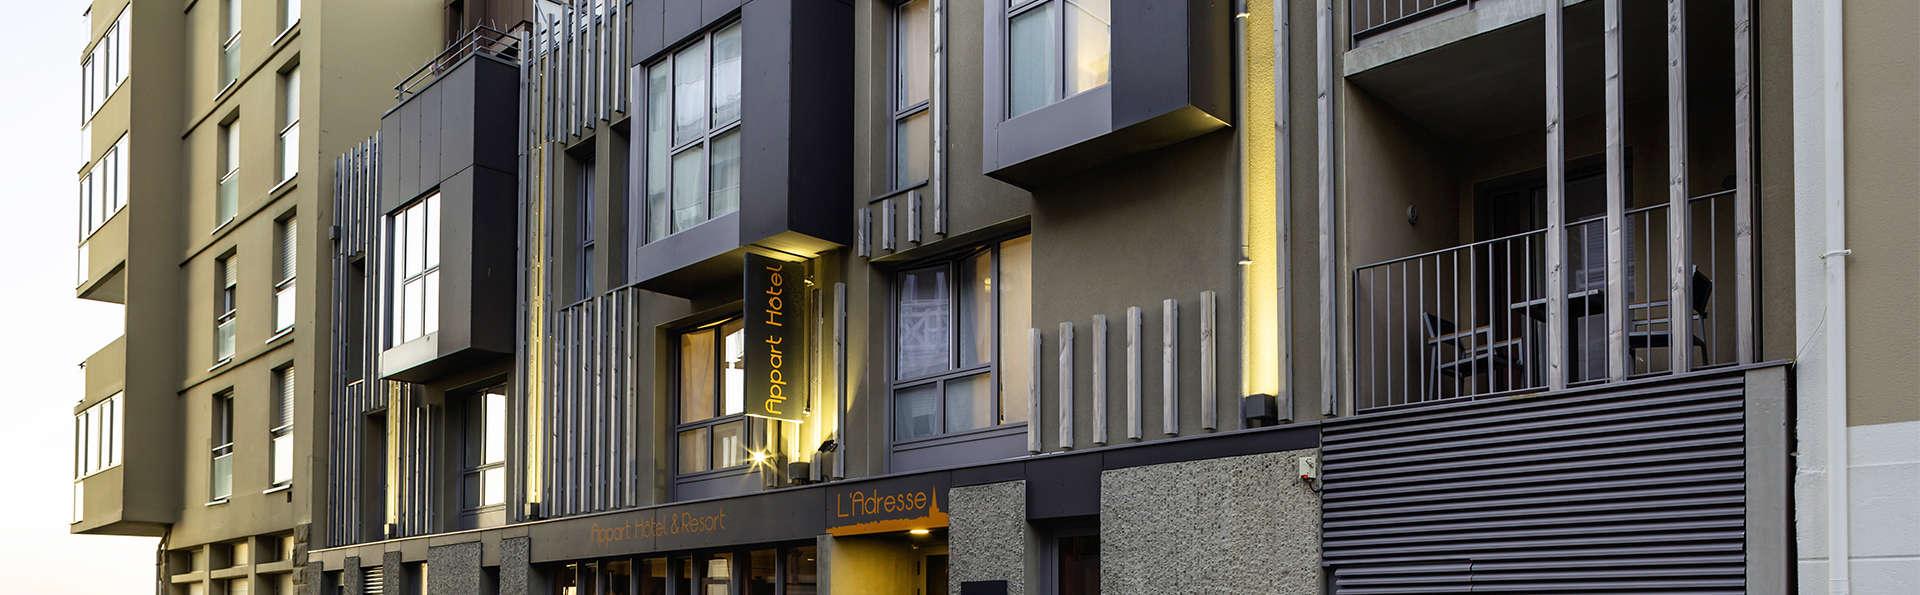 HOTEL **** & APPART HOTEL L'ADRESSE  - EDIT_Exterior1.jpg